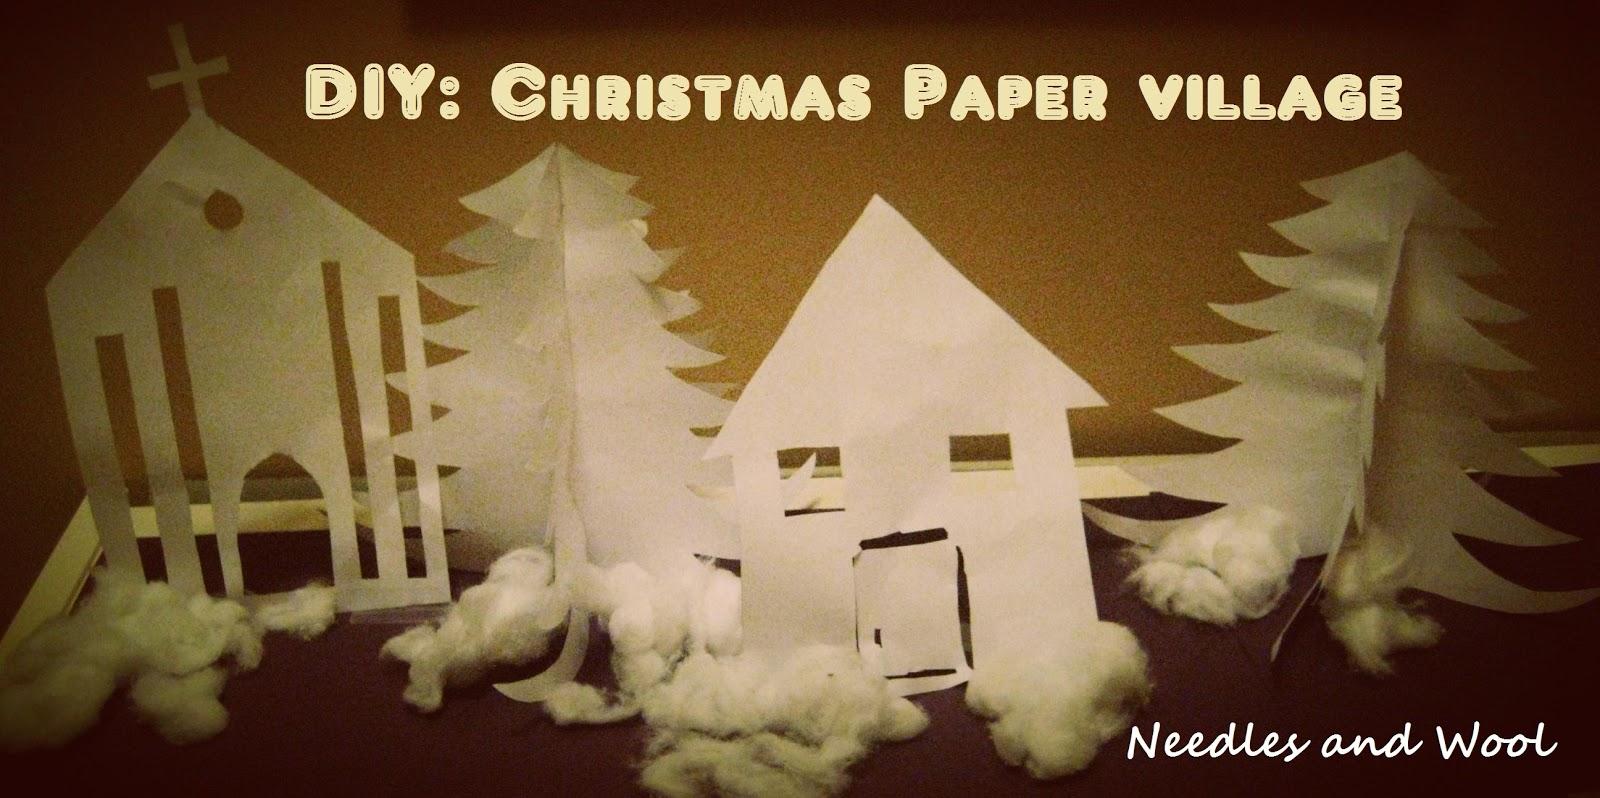 DIY Christmas Village